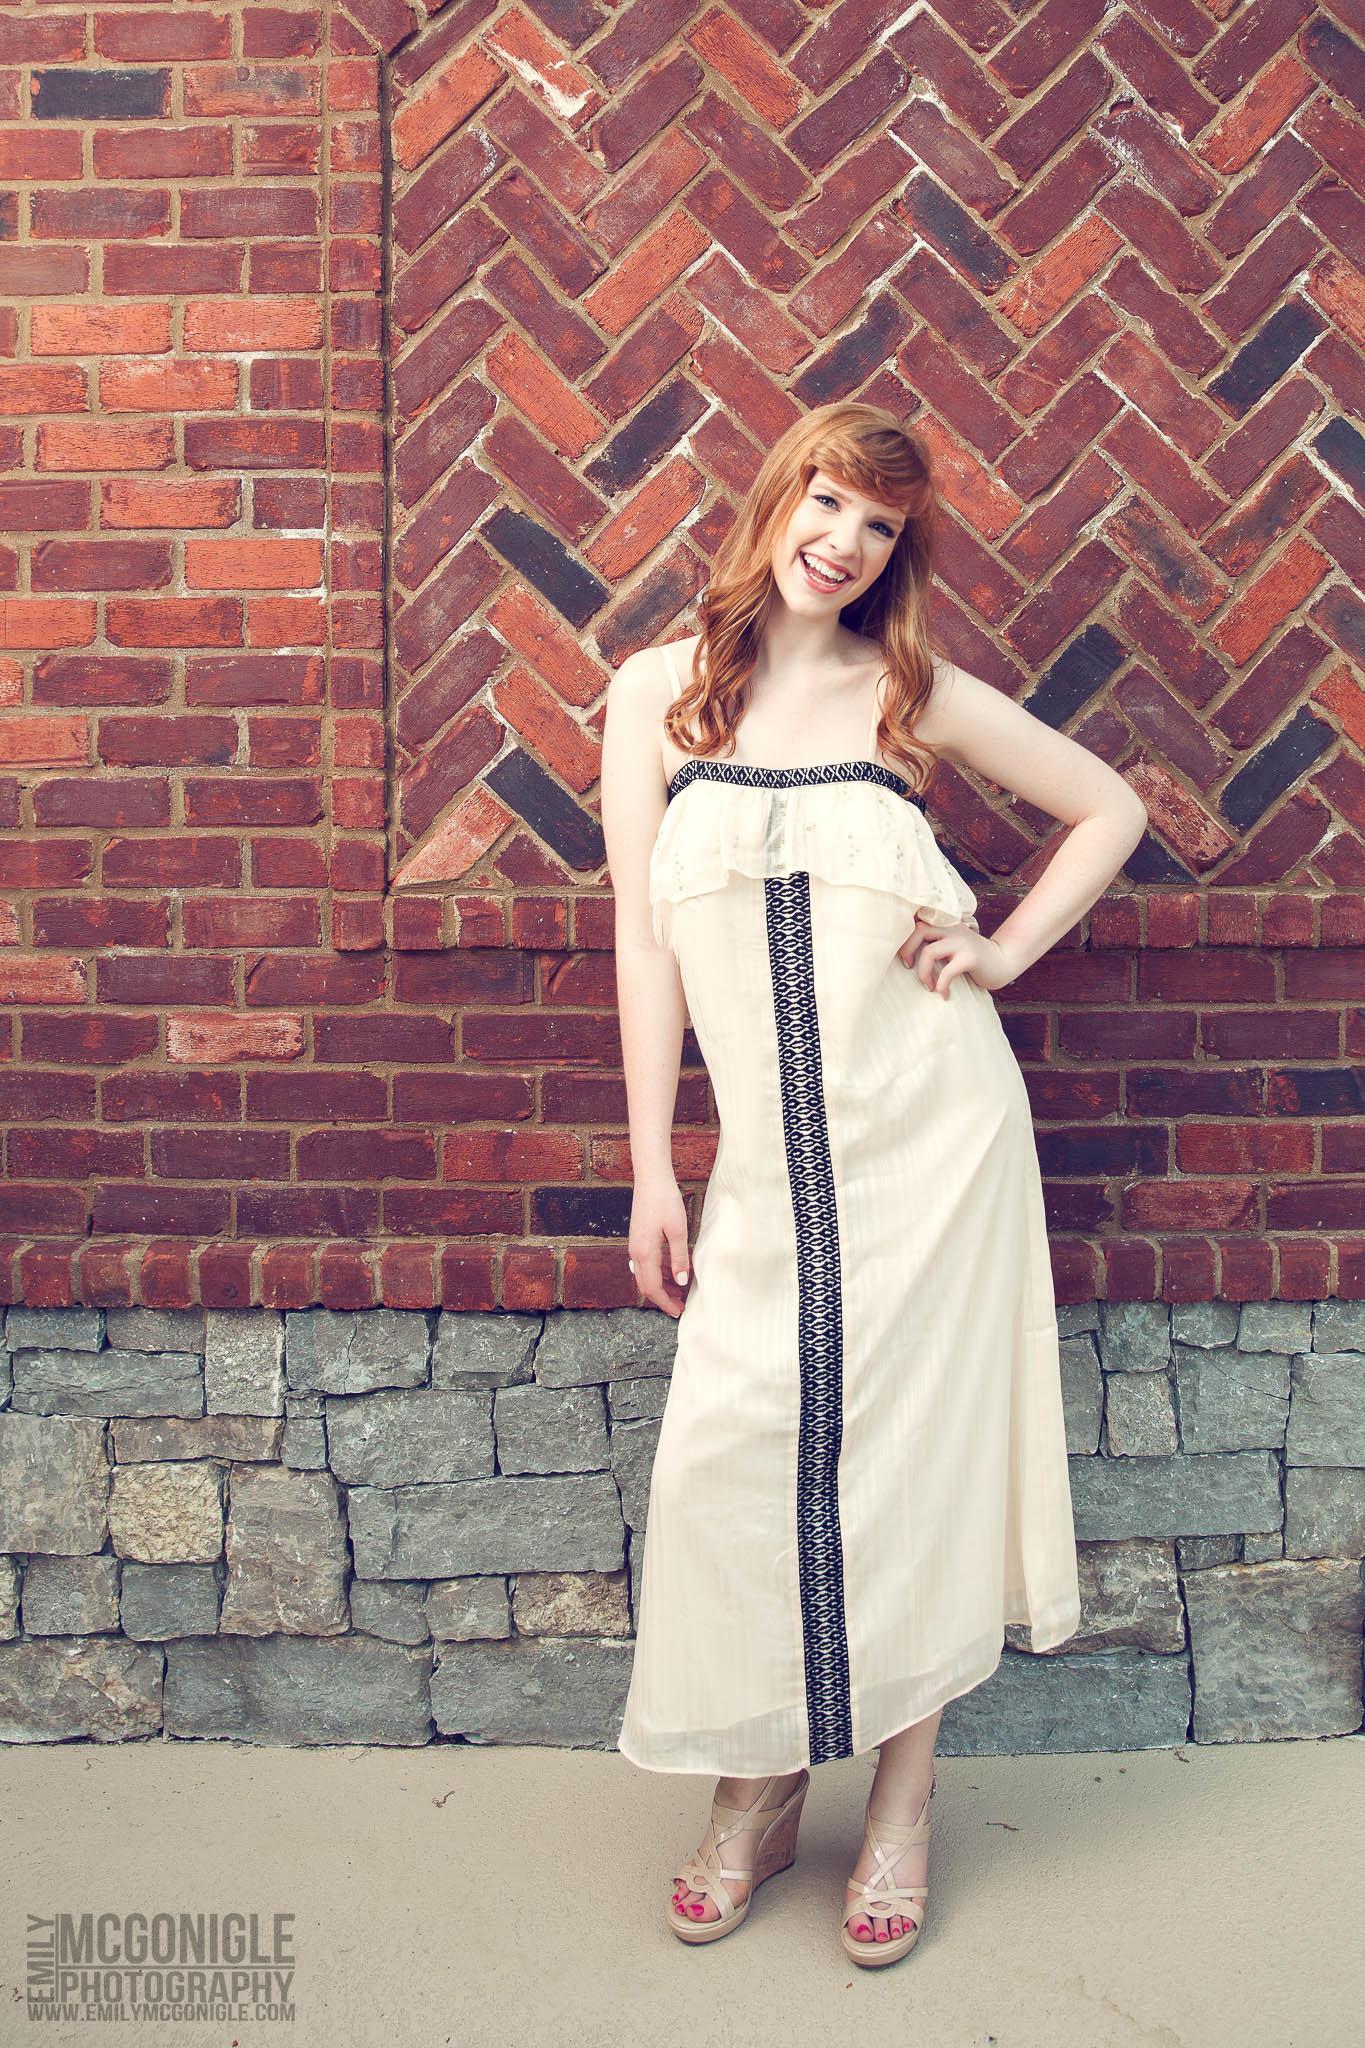 brick-wall-white-dress-girl.jpg